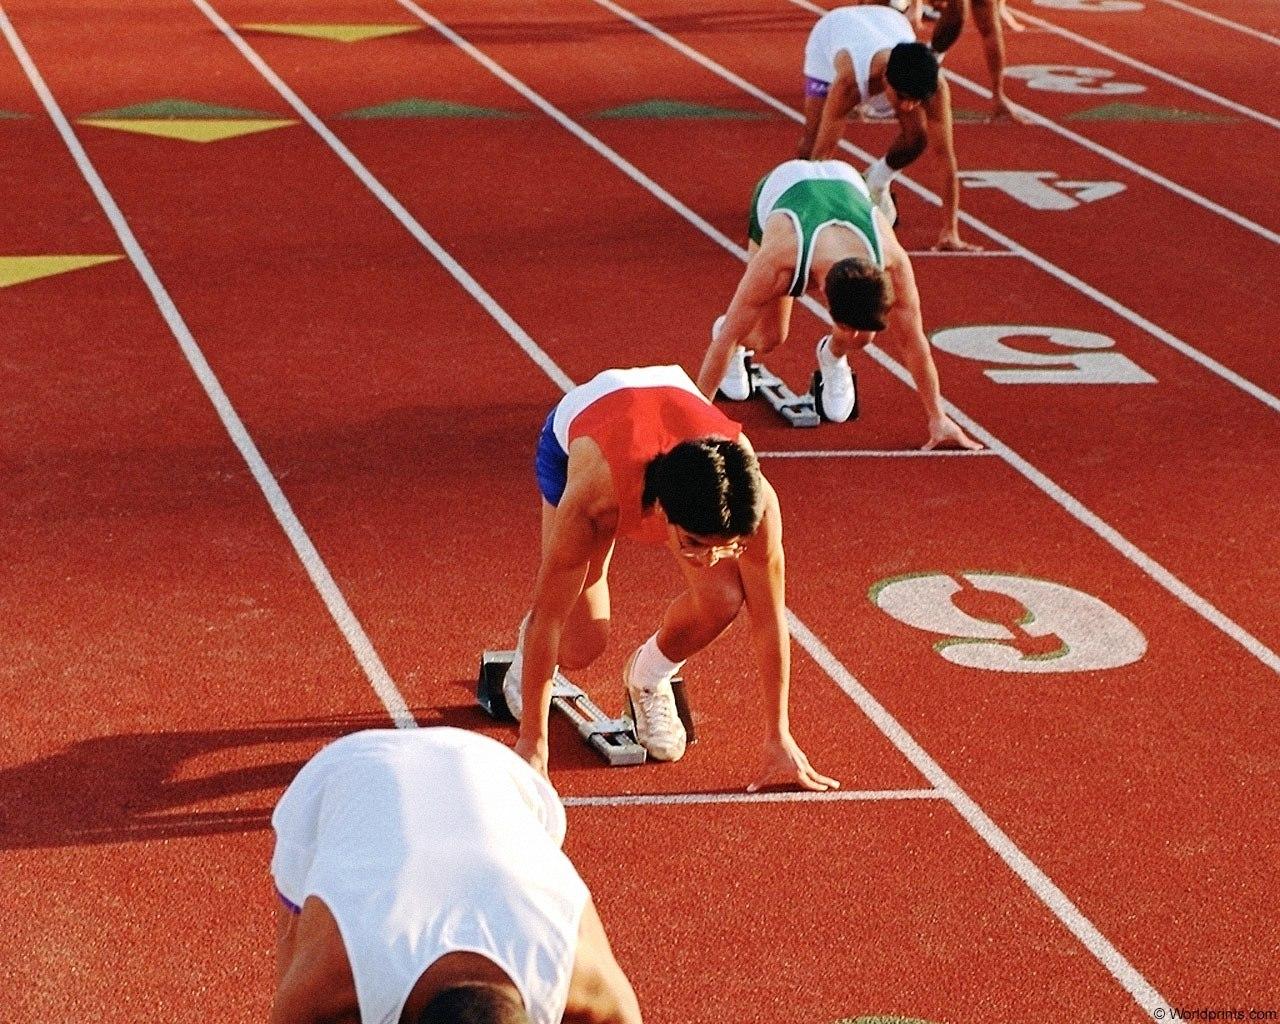 Легкая атлетика - Центр спортивной подготовки Республики Татарстан